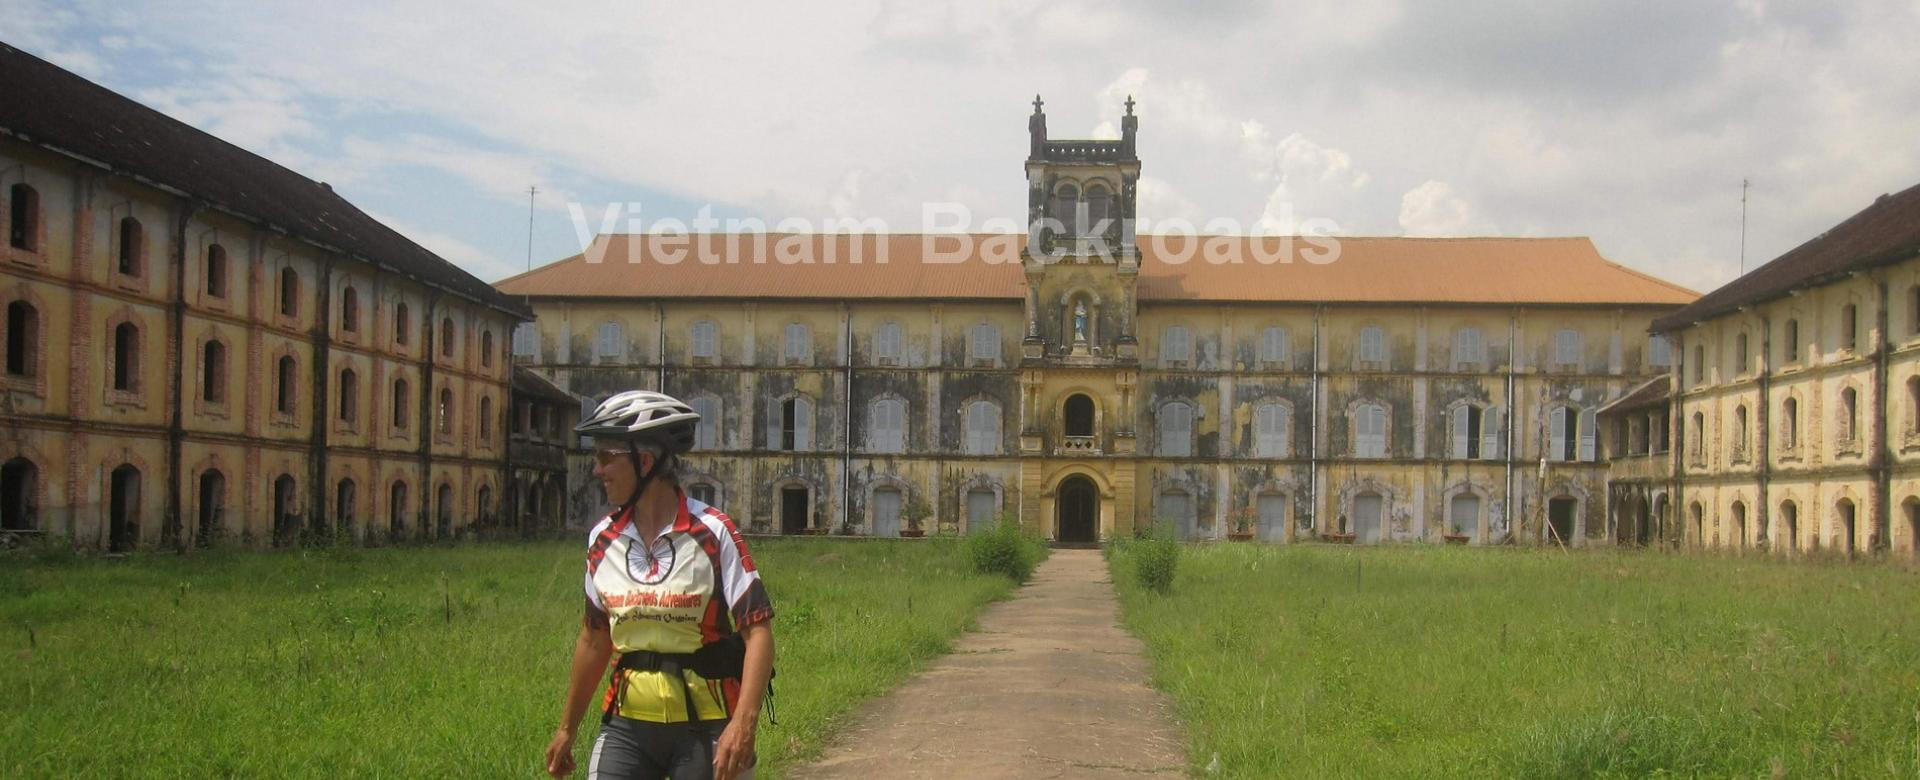 Meandering Mekong Delta with Vietnam Backroads